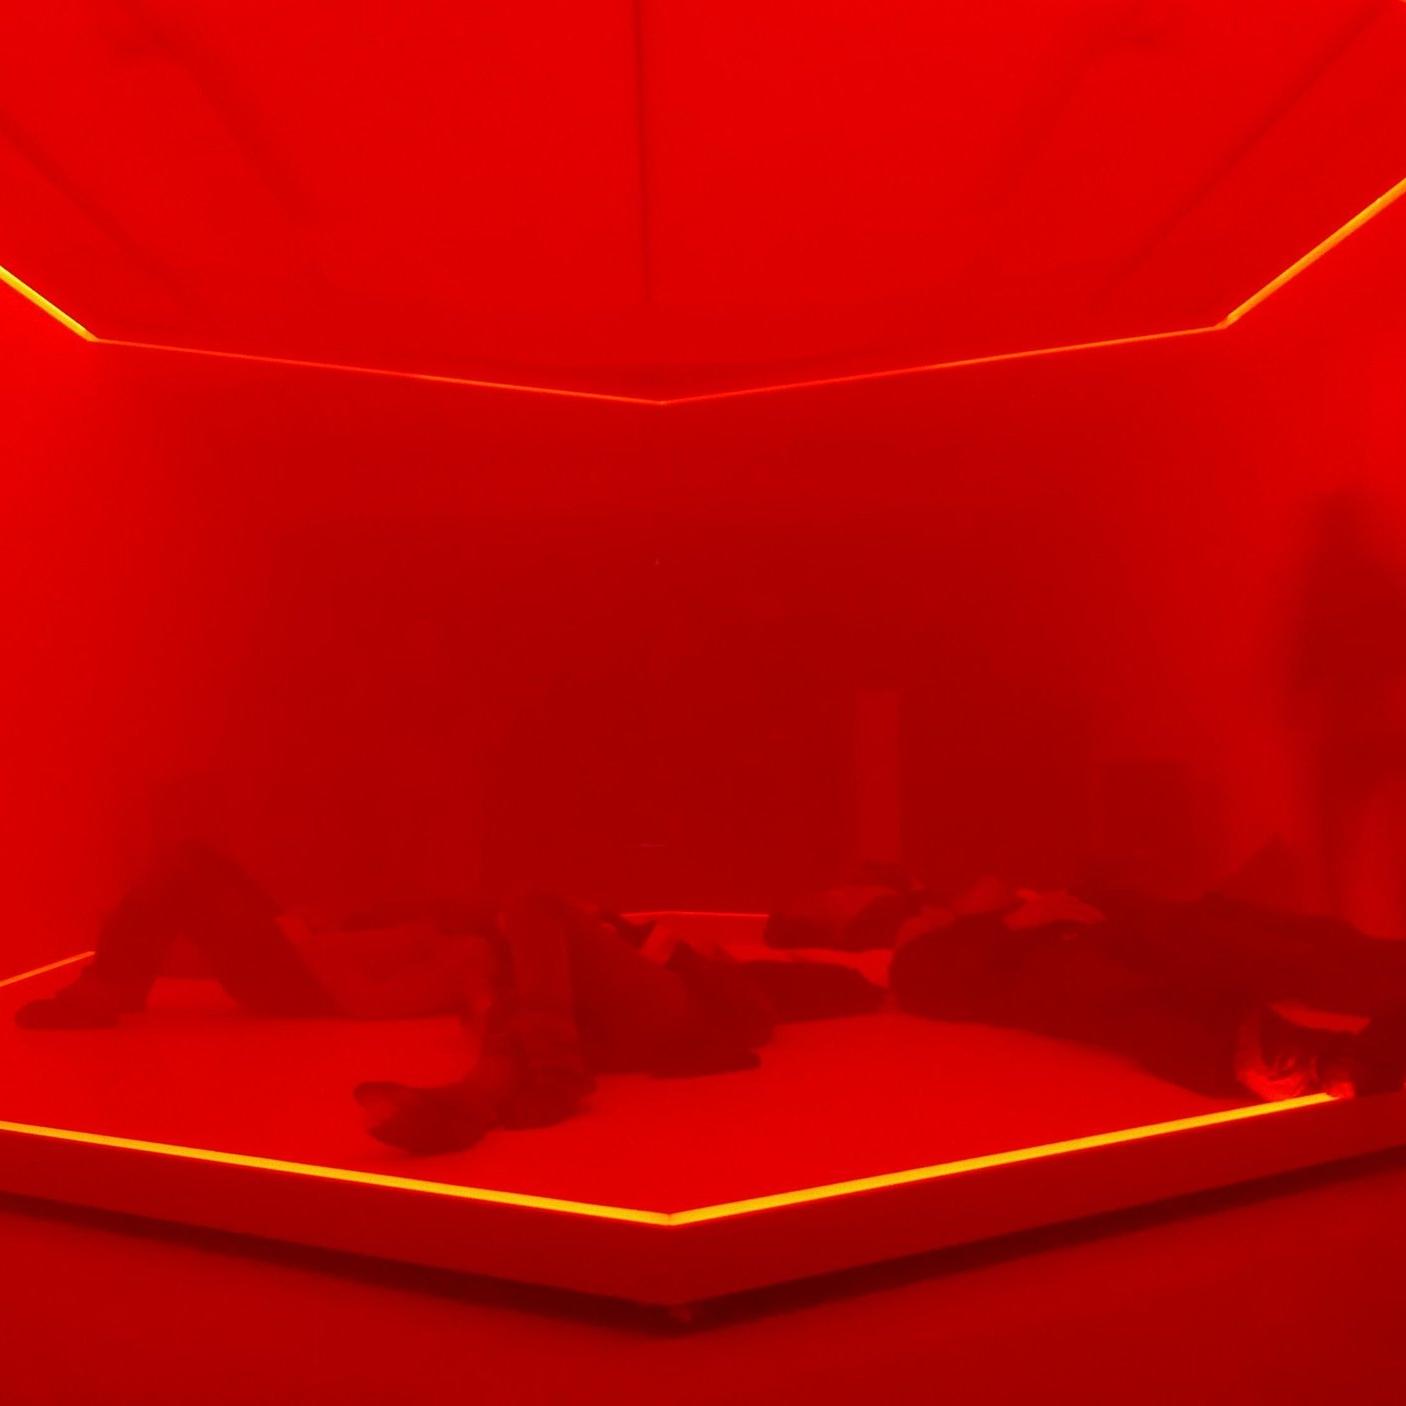 Chris Salter, Displace, V.2 - The Hague, 2012